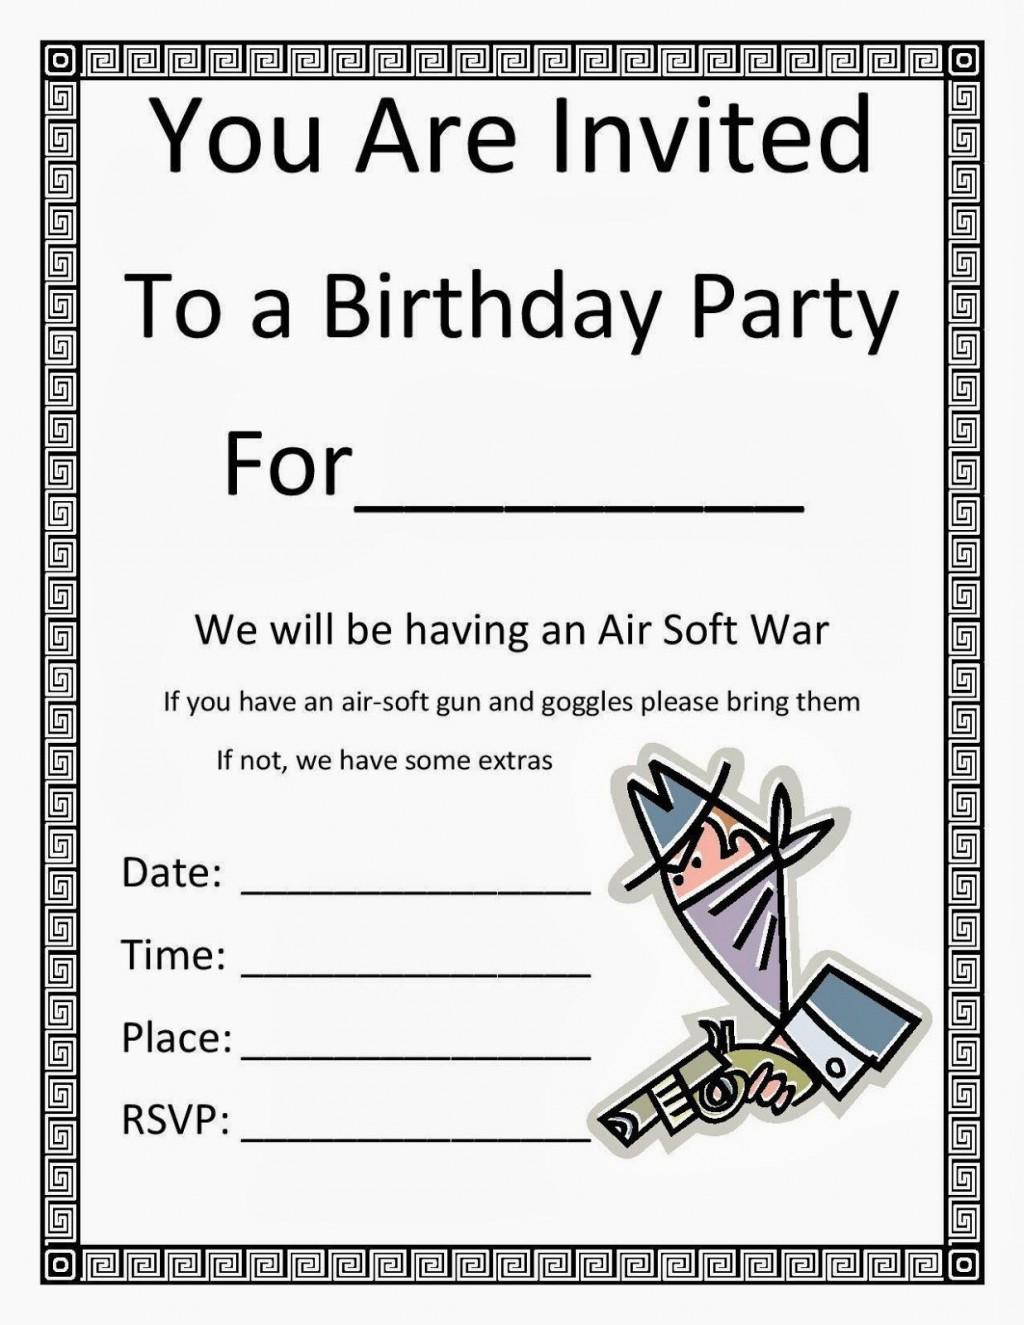 002 Marvelou Microsoft Office Invitation Template Image  Templates Holiday Party PublisherLarge